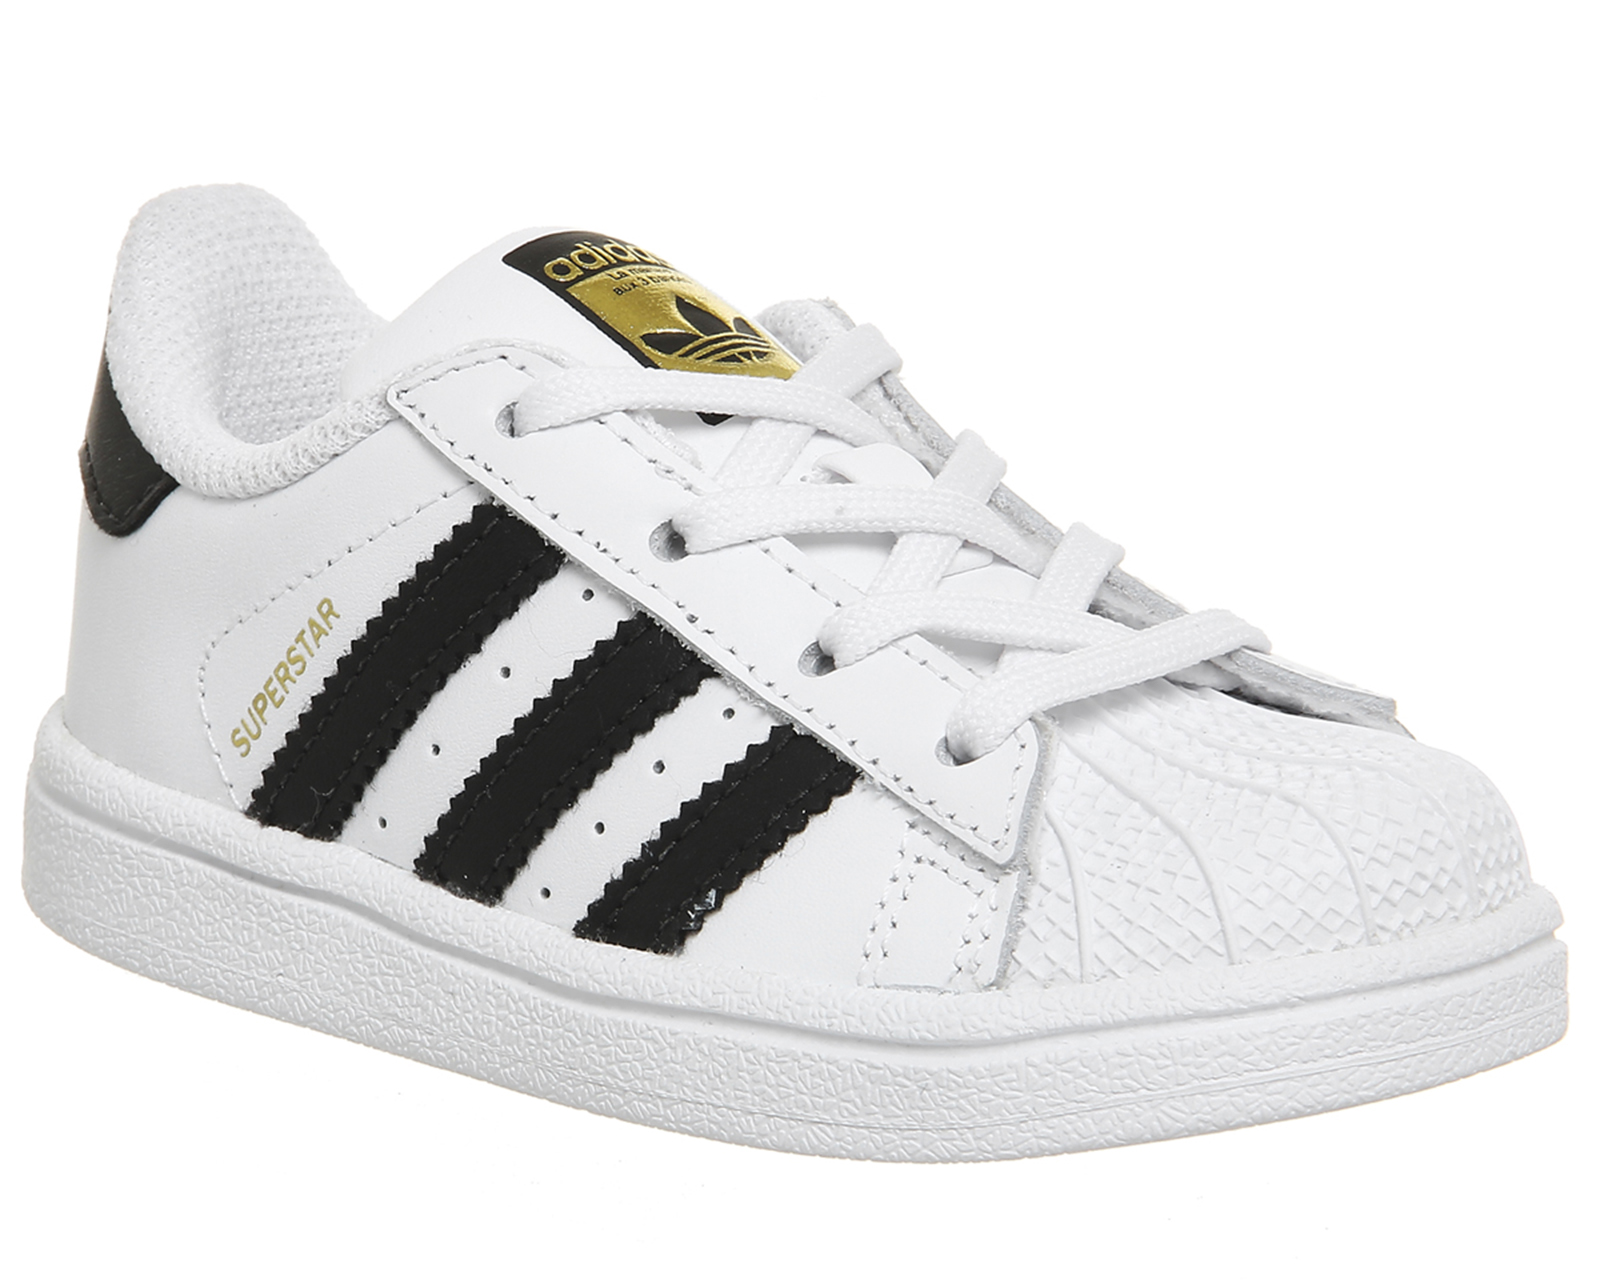 d46b00a0bac7 adidas Superstar CF i, Scarpe da Ginnastica Basse Unisex-Bimbi, Bianco  (Footwear